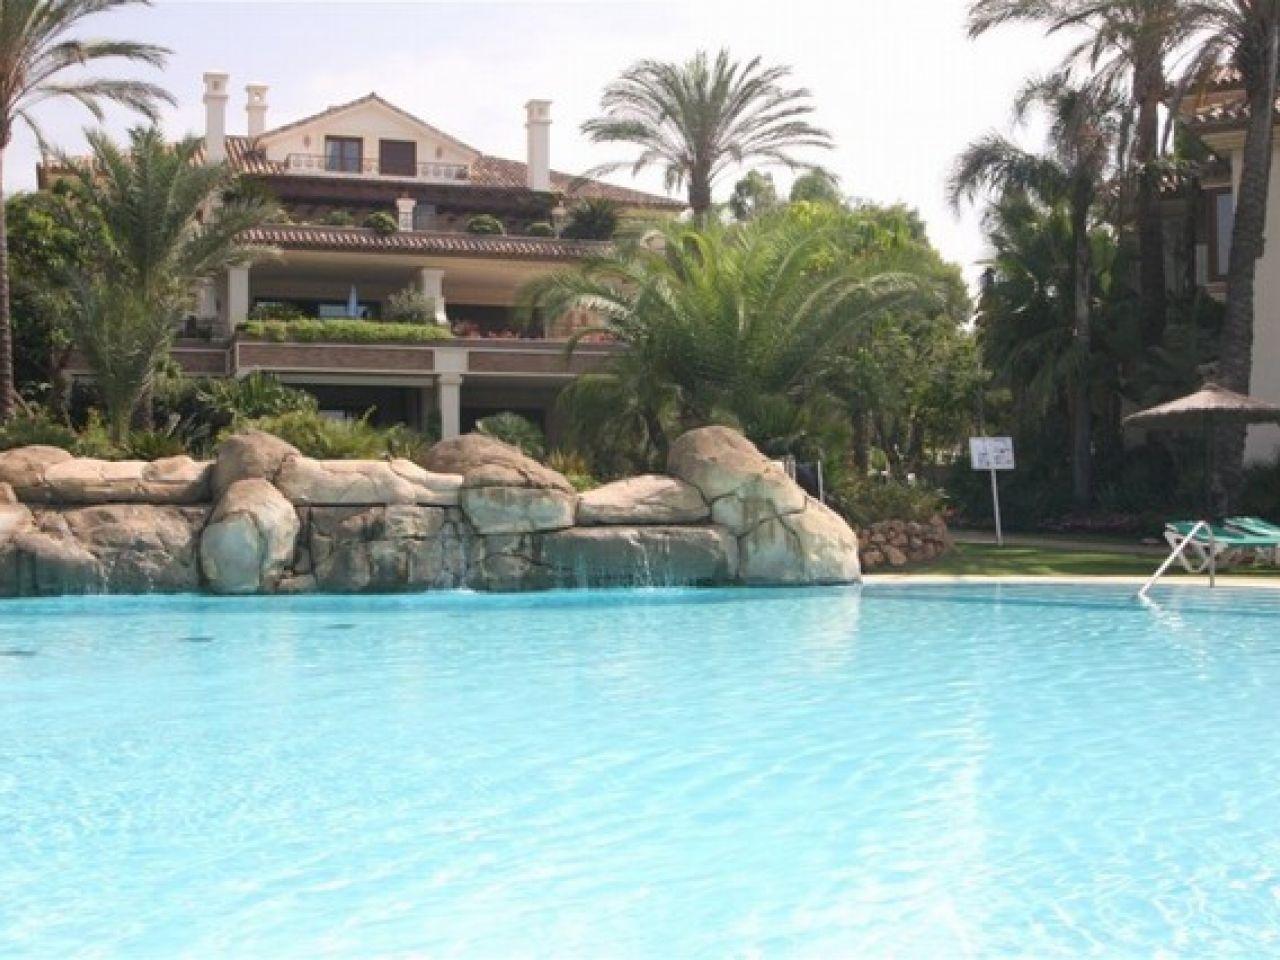 Apartment for Sale and Rent in Los Monteros Playa, Marbella Este